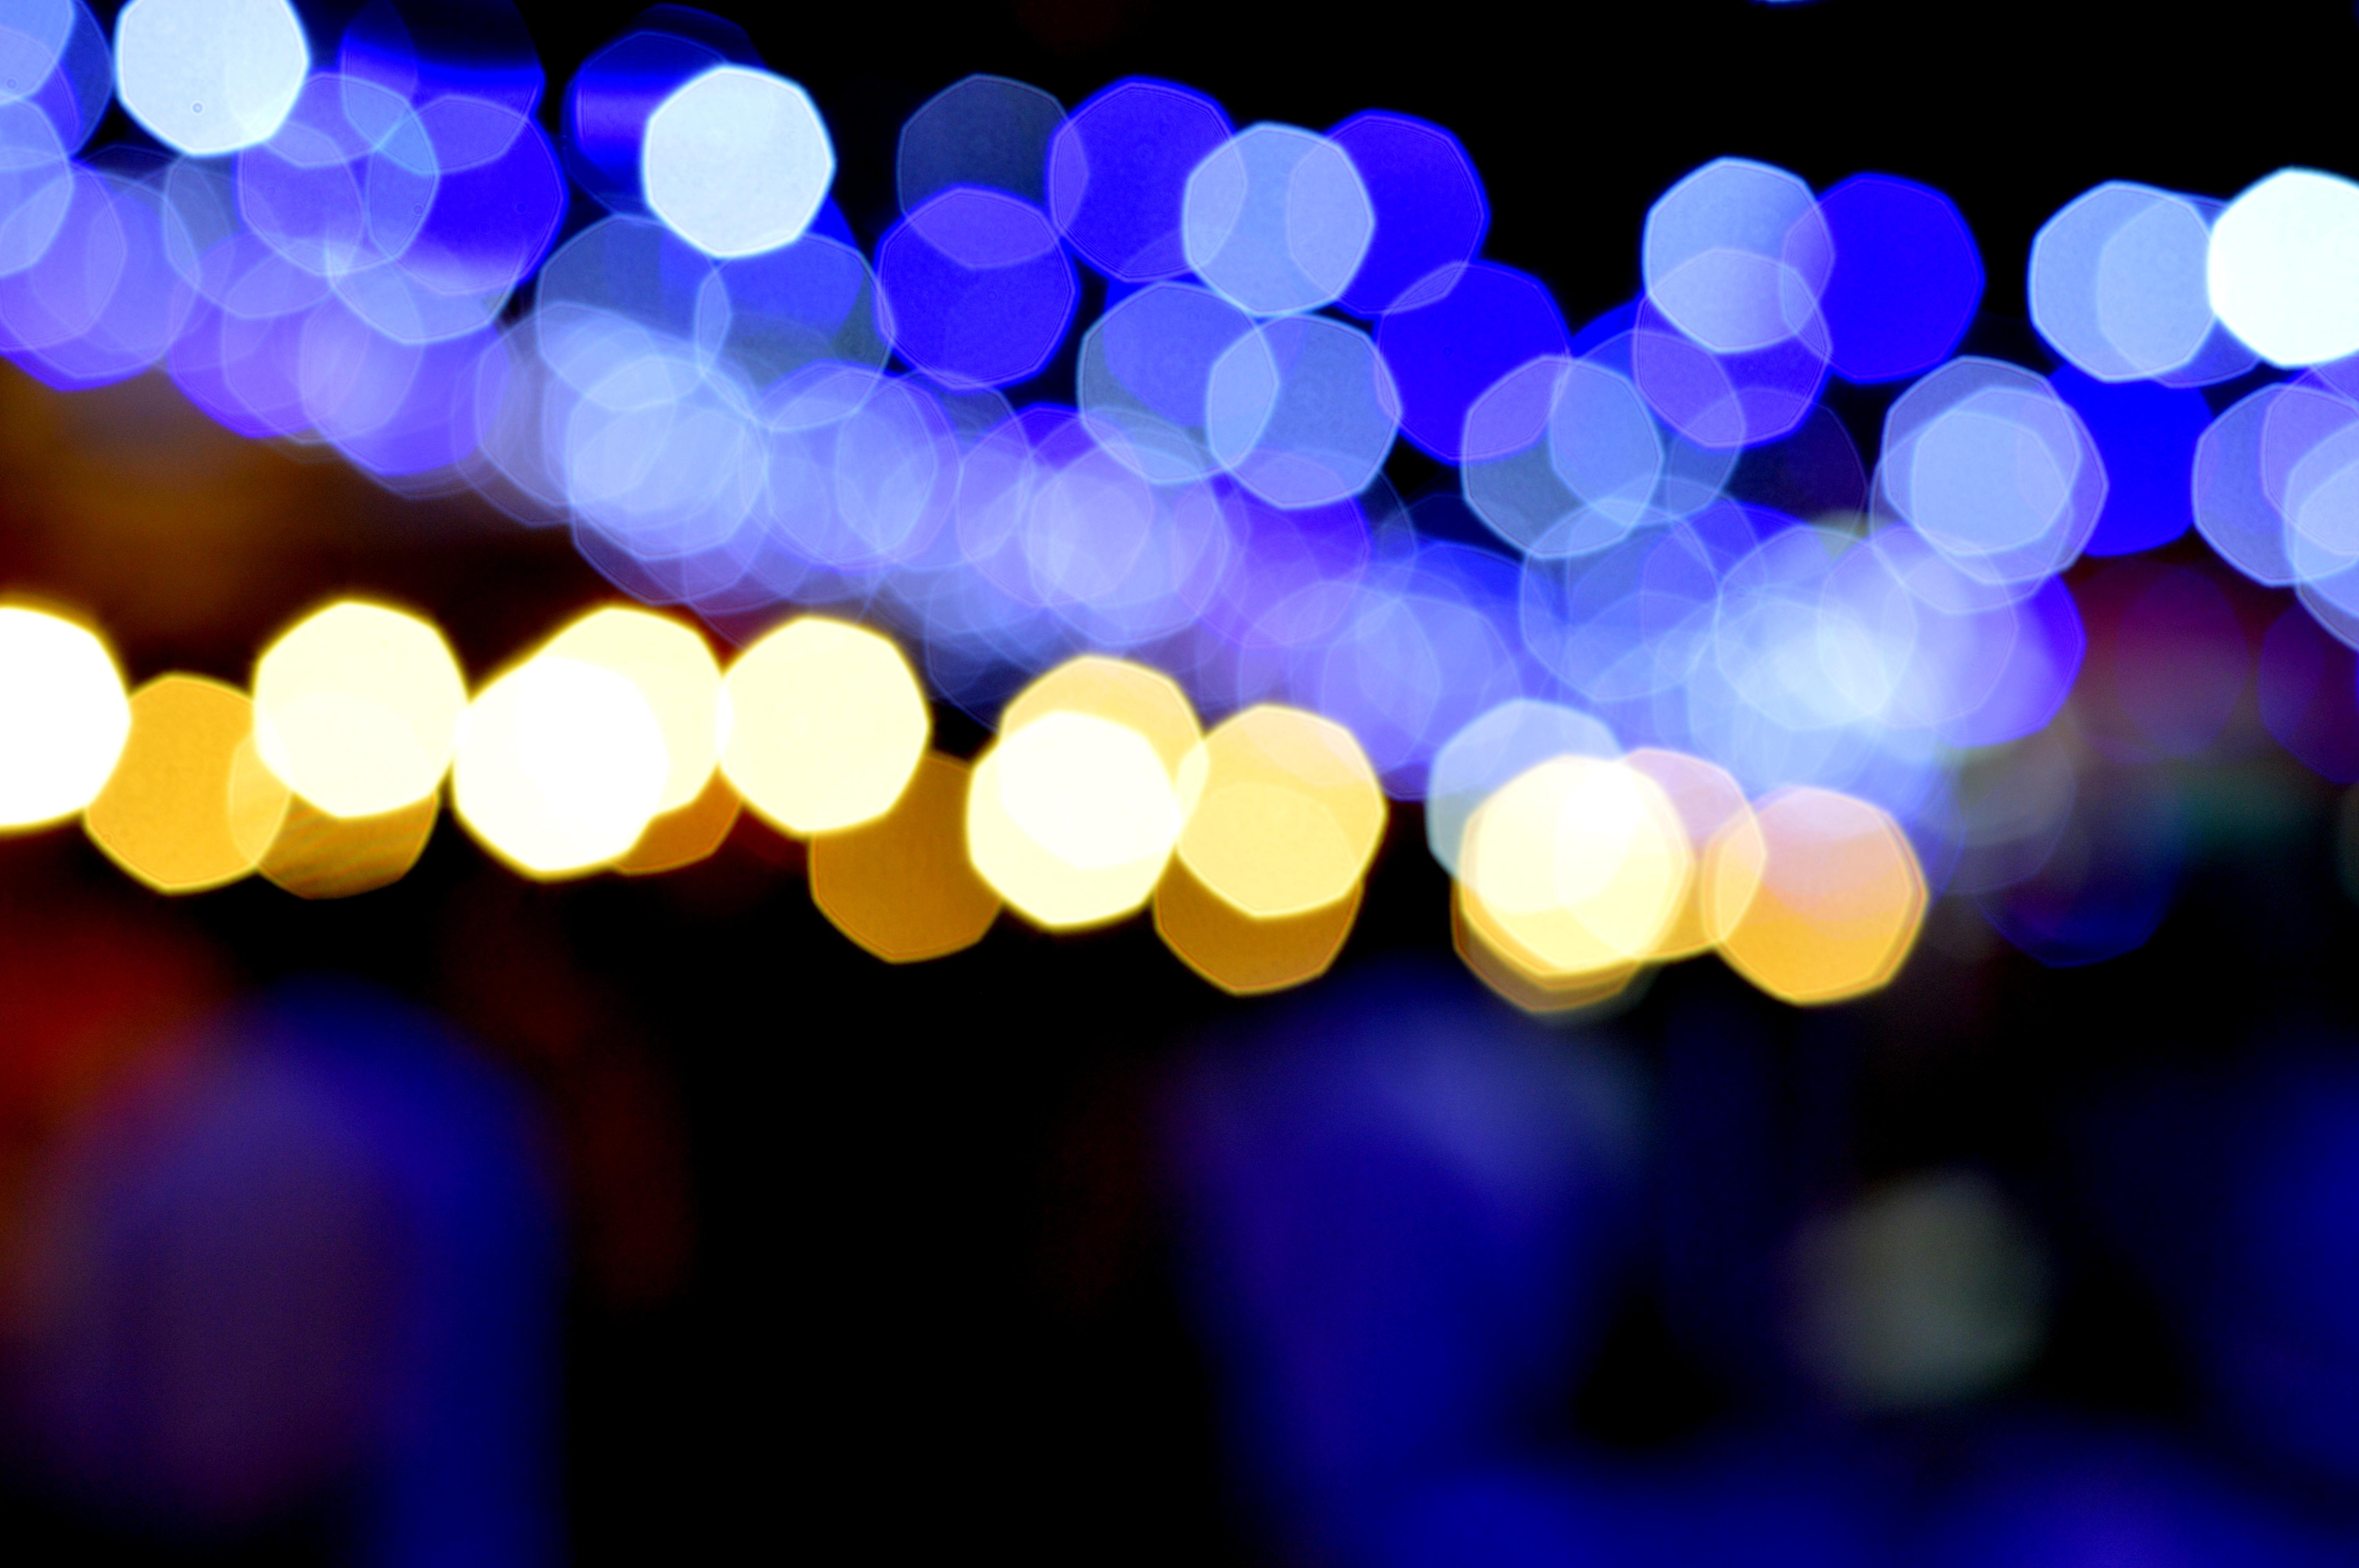 Fotos Gratis : Ligero, Bokeh, Noche, Luz De Sol, Púrpura